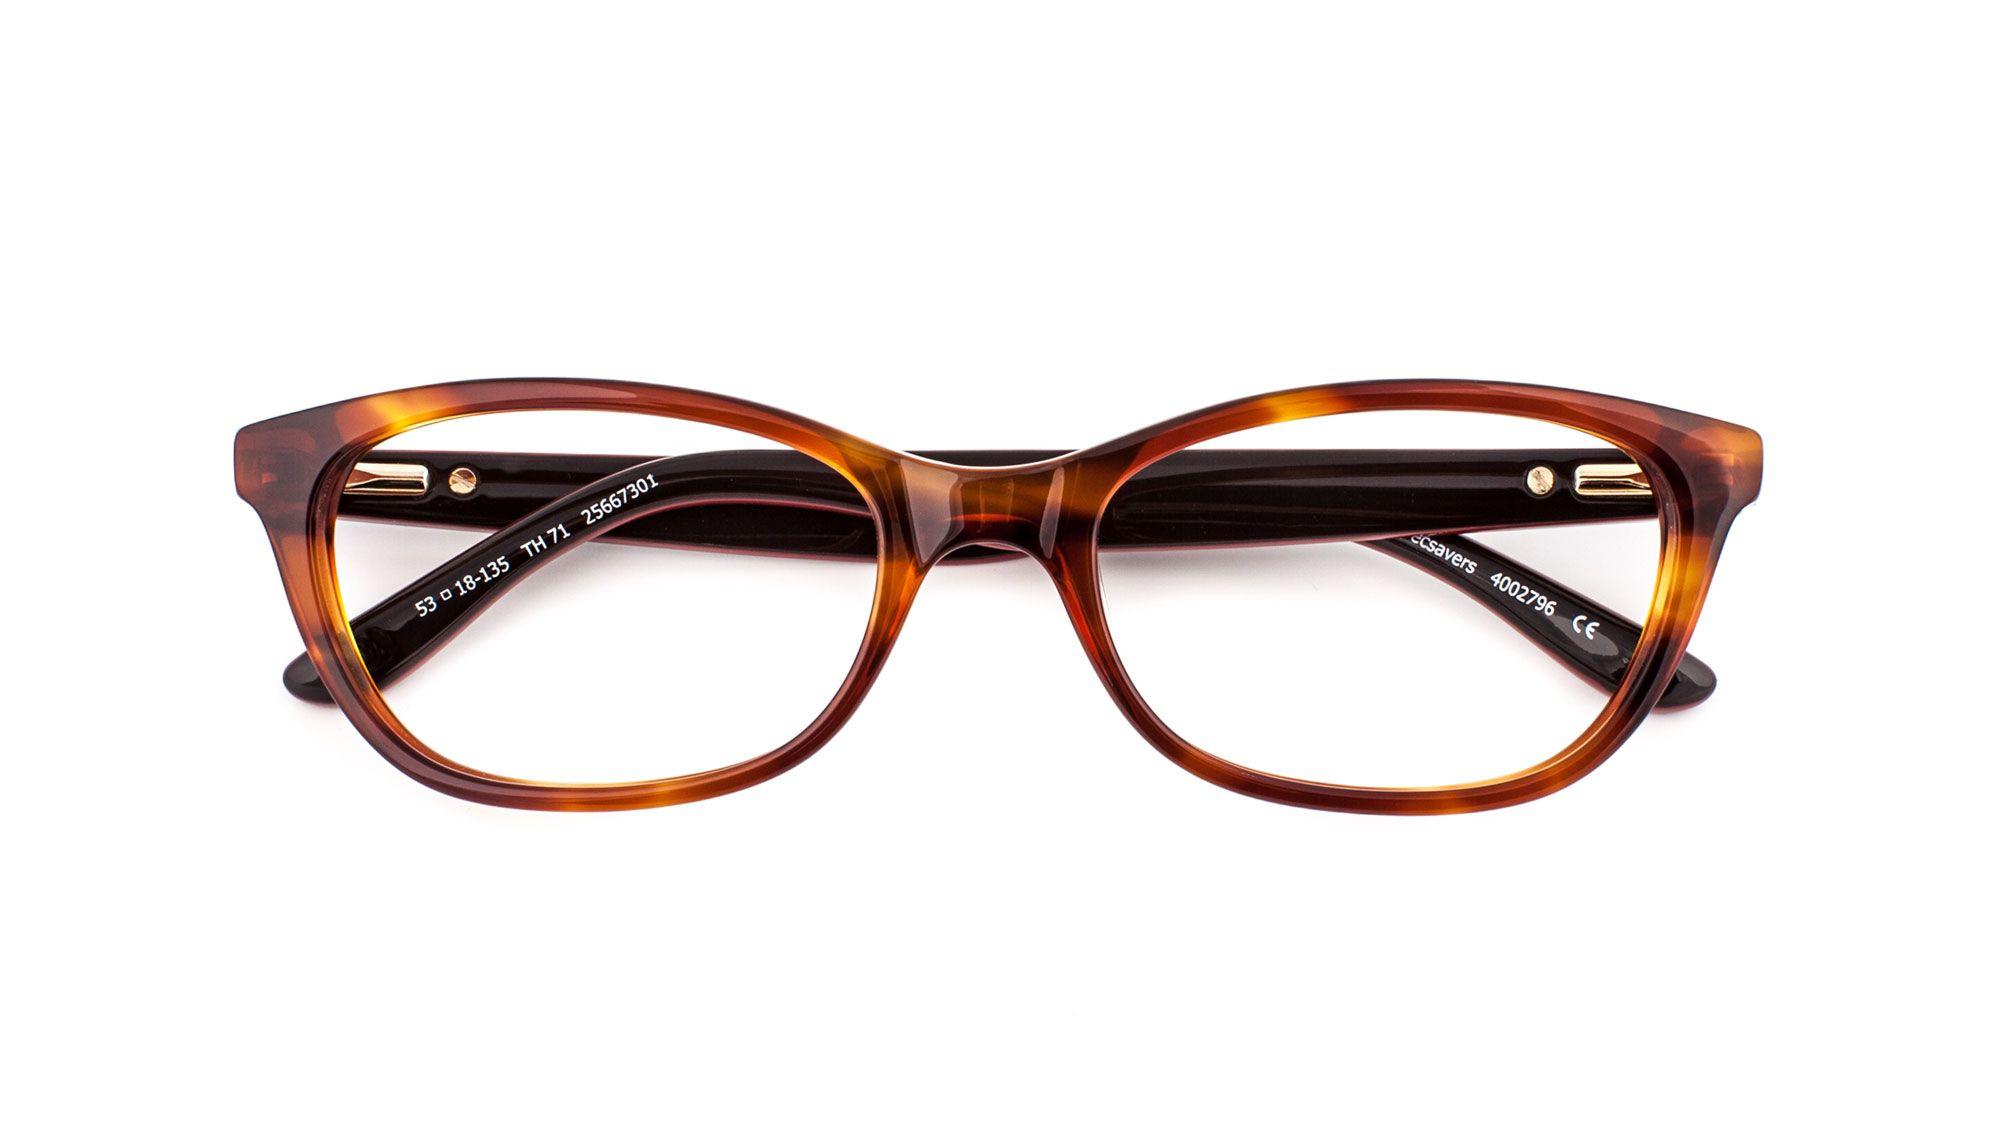 b0c3582b05c5 TH 71 Glasses by Tommy Hilfiger